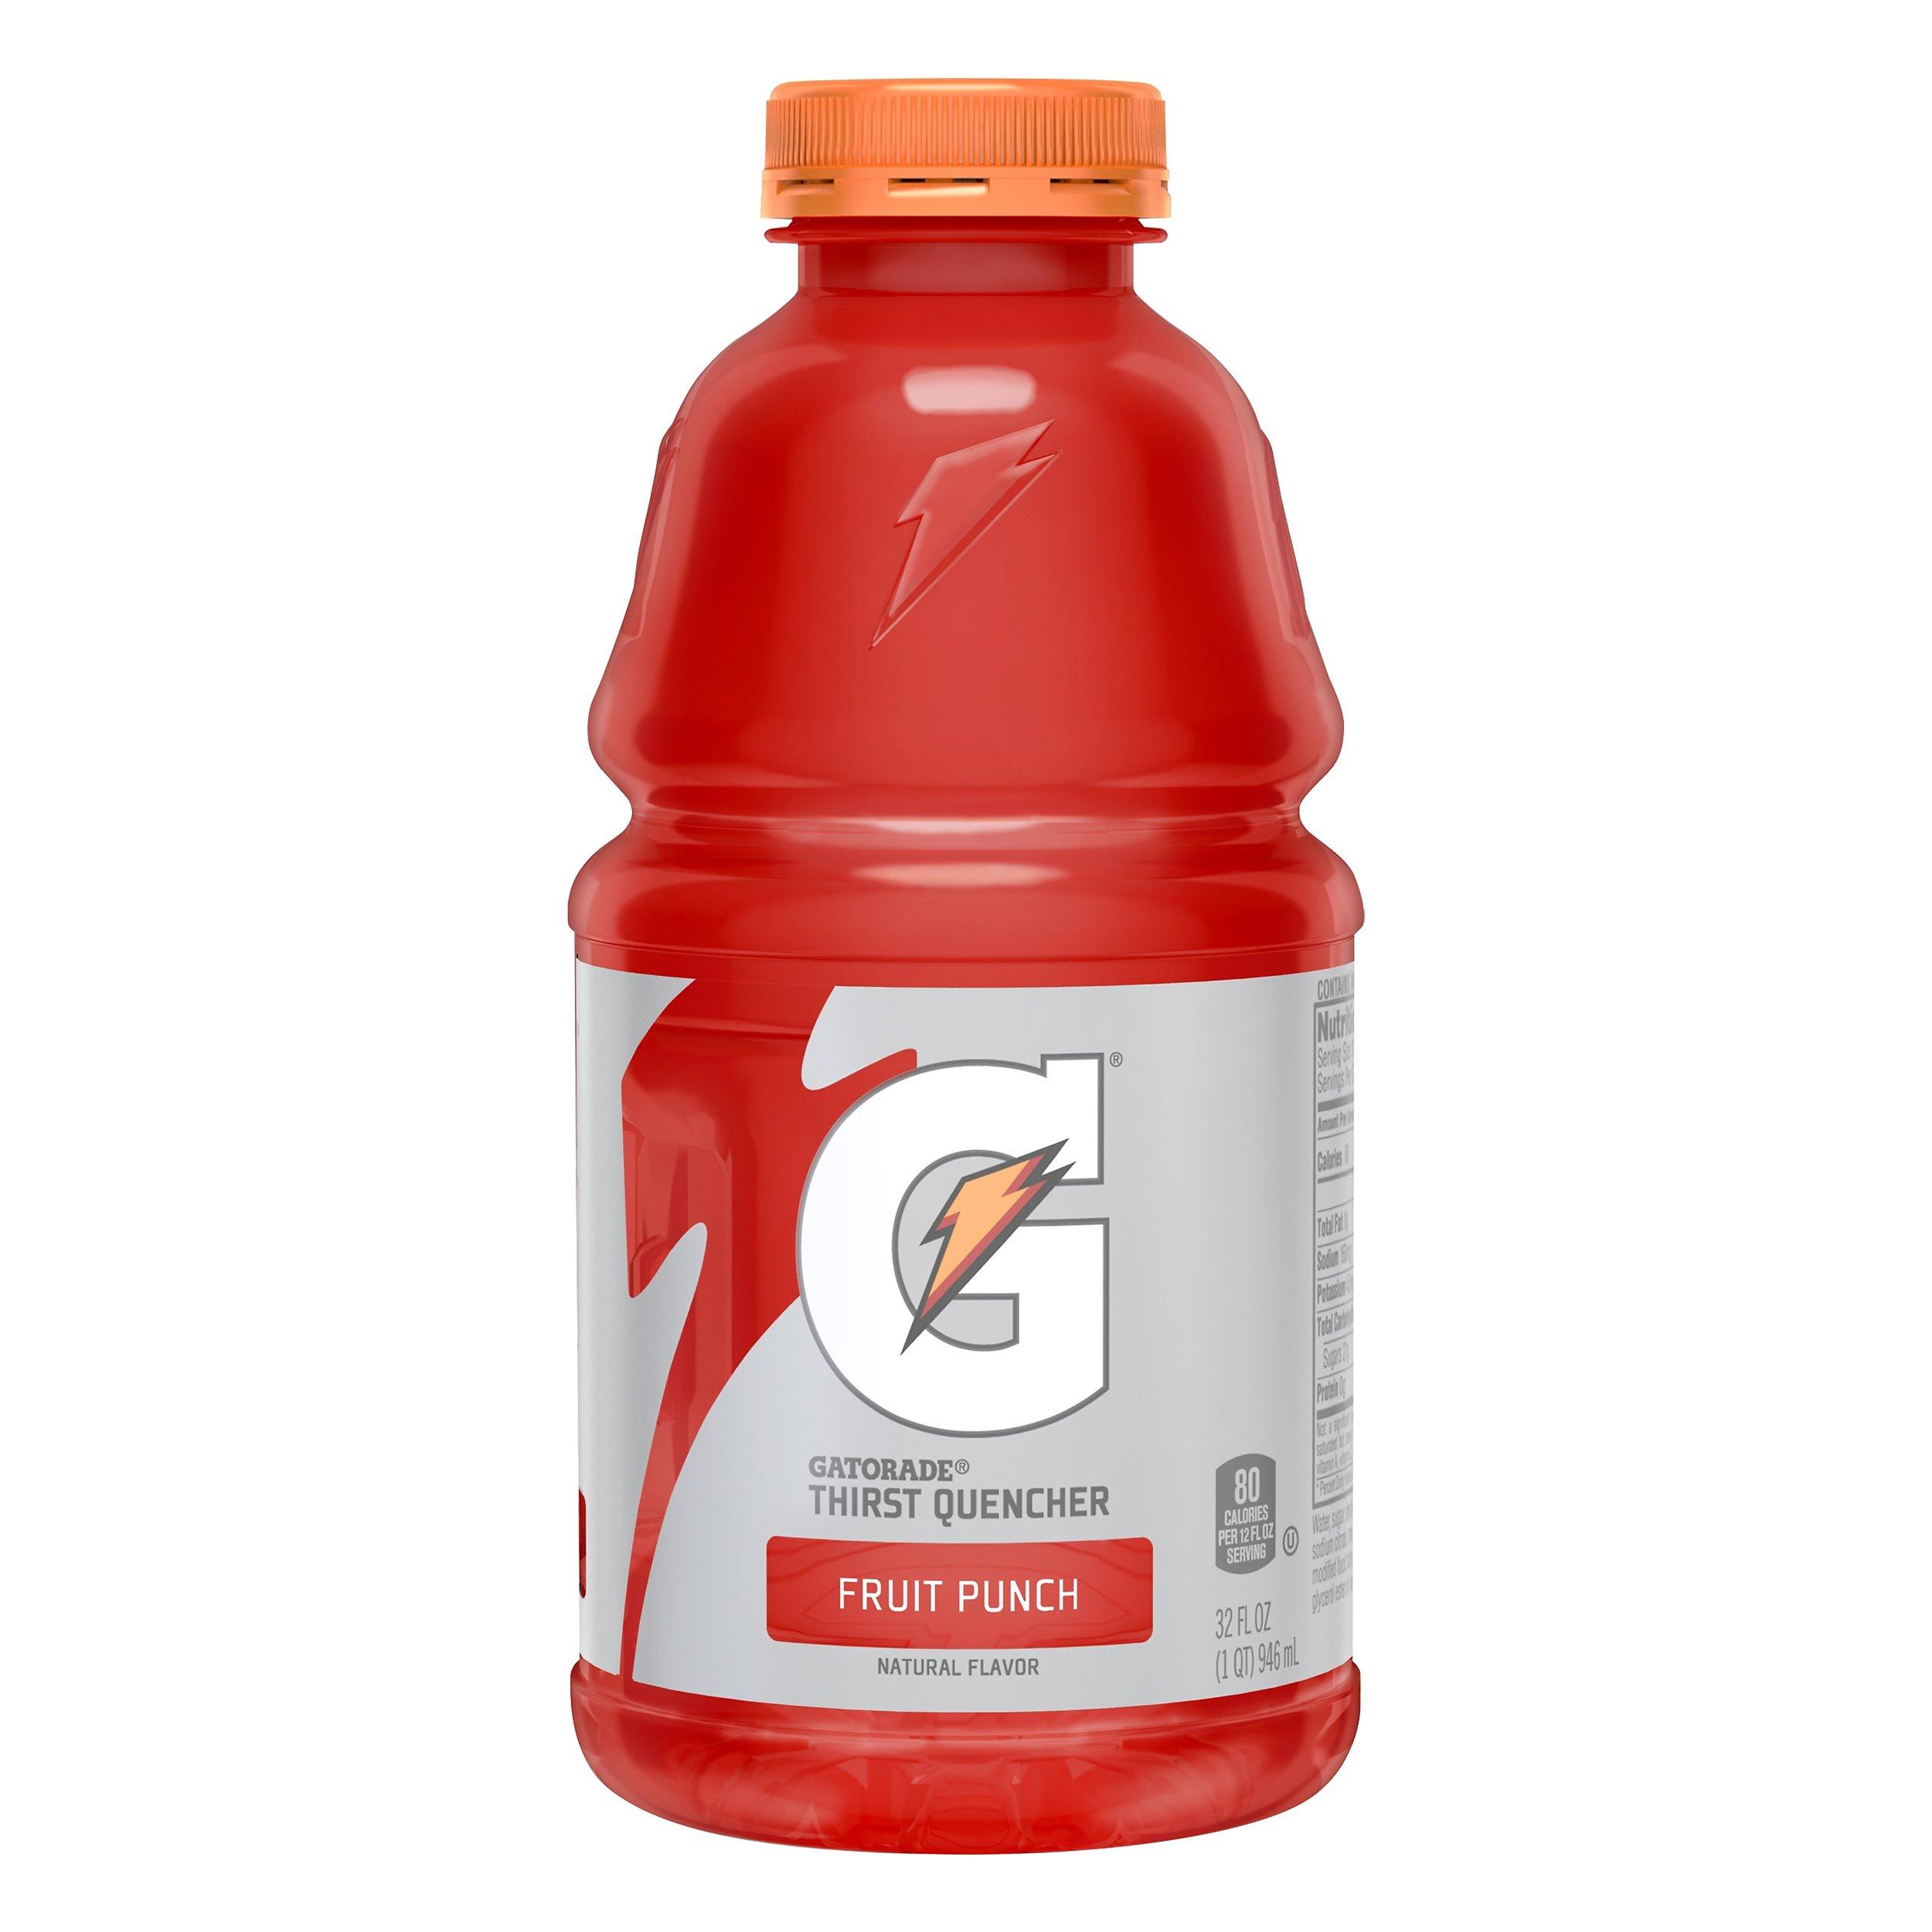 Gatorade Fruit Punch Sports Drink 32OZ 12-Pack